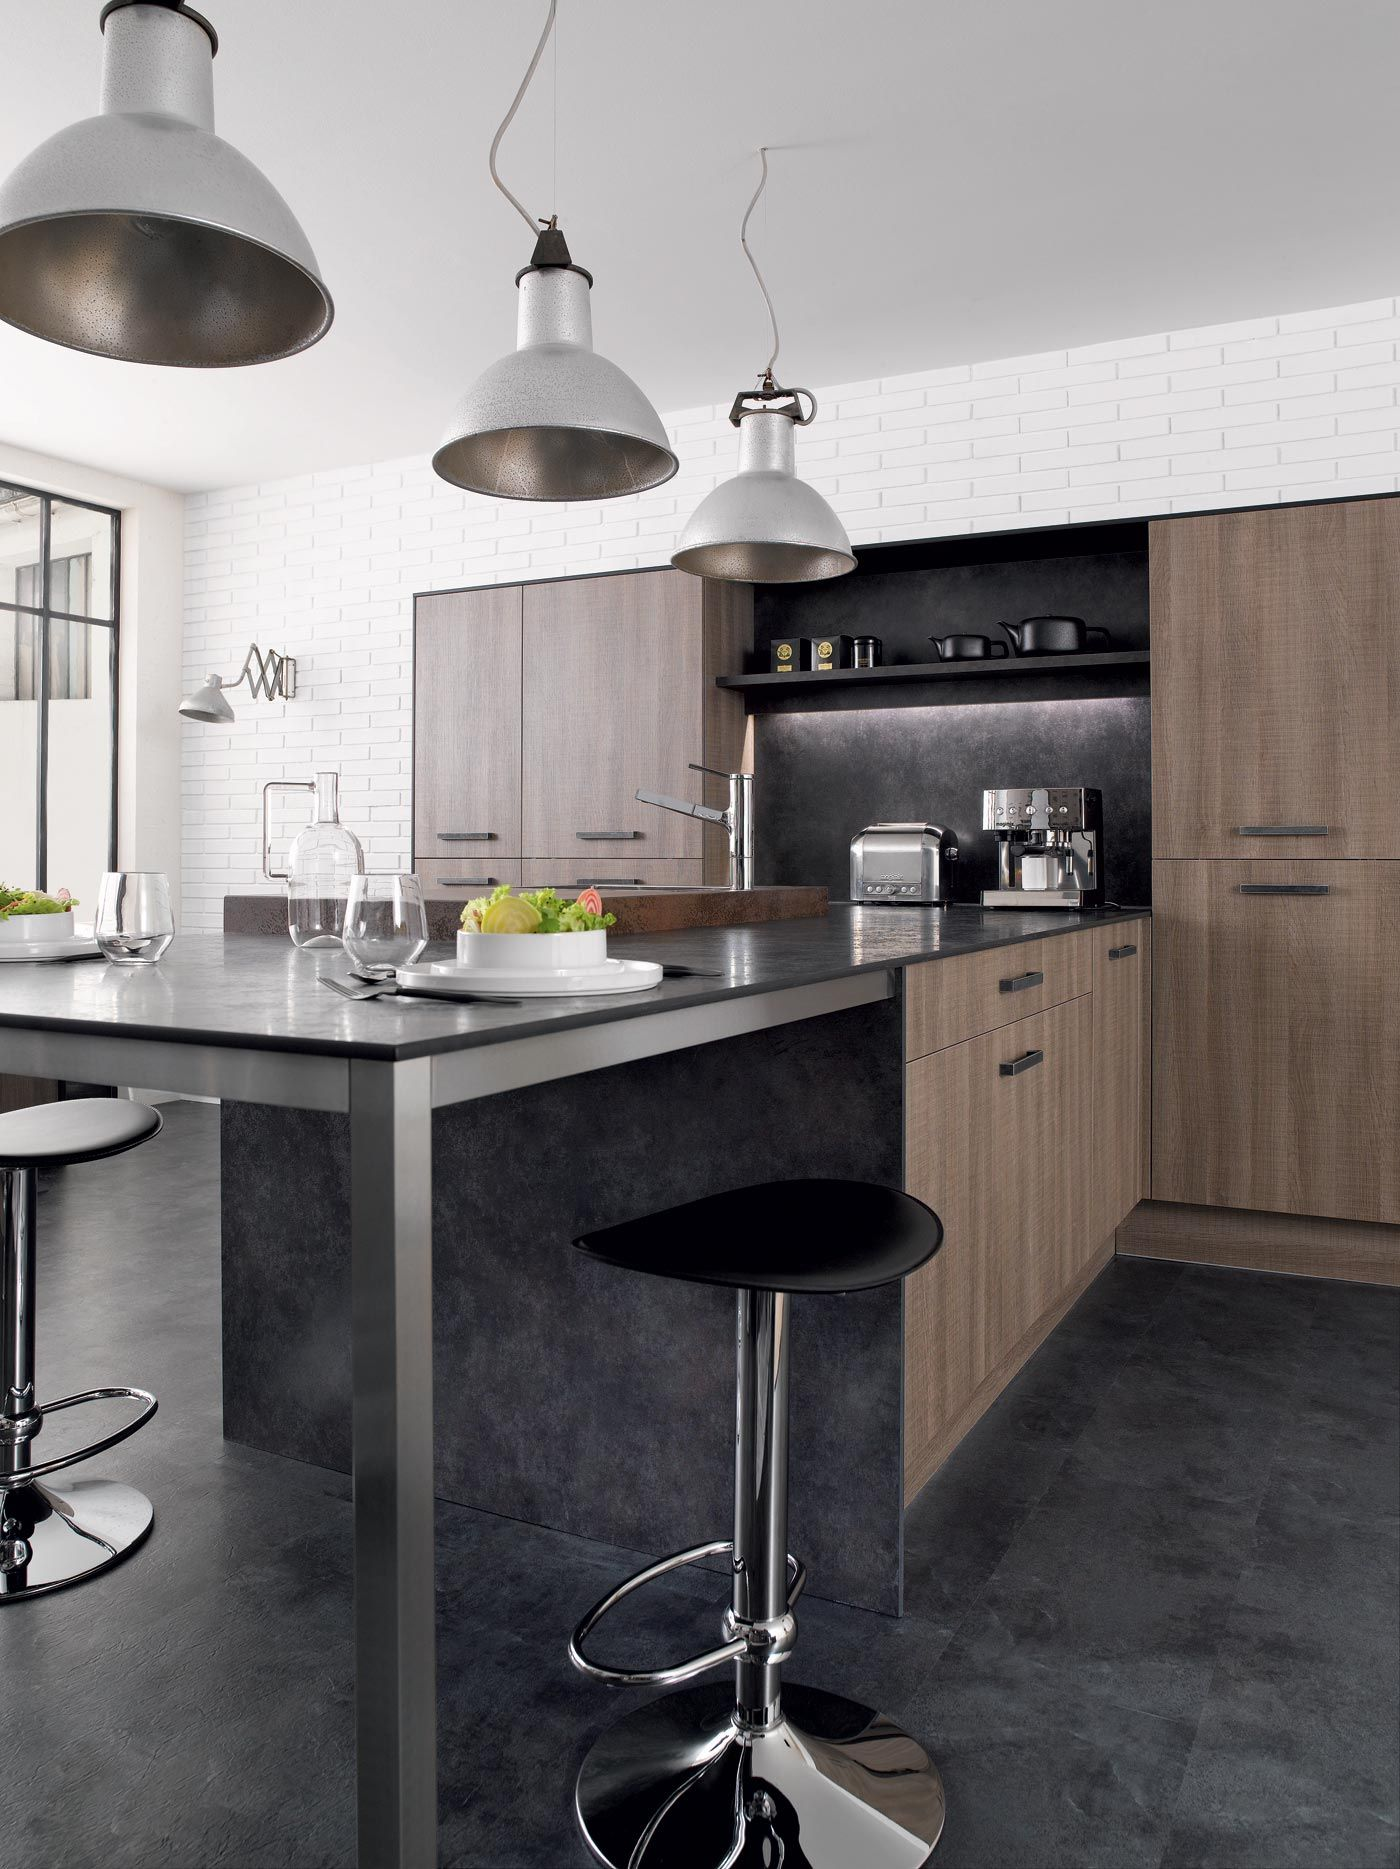 cuisine aster rustica gris perene lyon id e pour ma cuisine pinterest aster lyon and. Black Bedroom Furniture Sets. Home Design Ideas